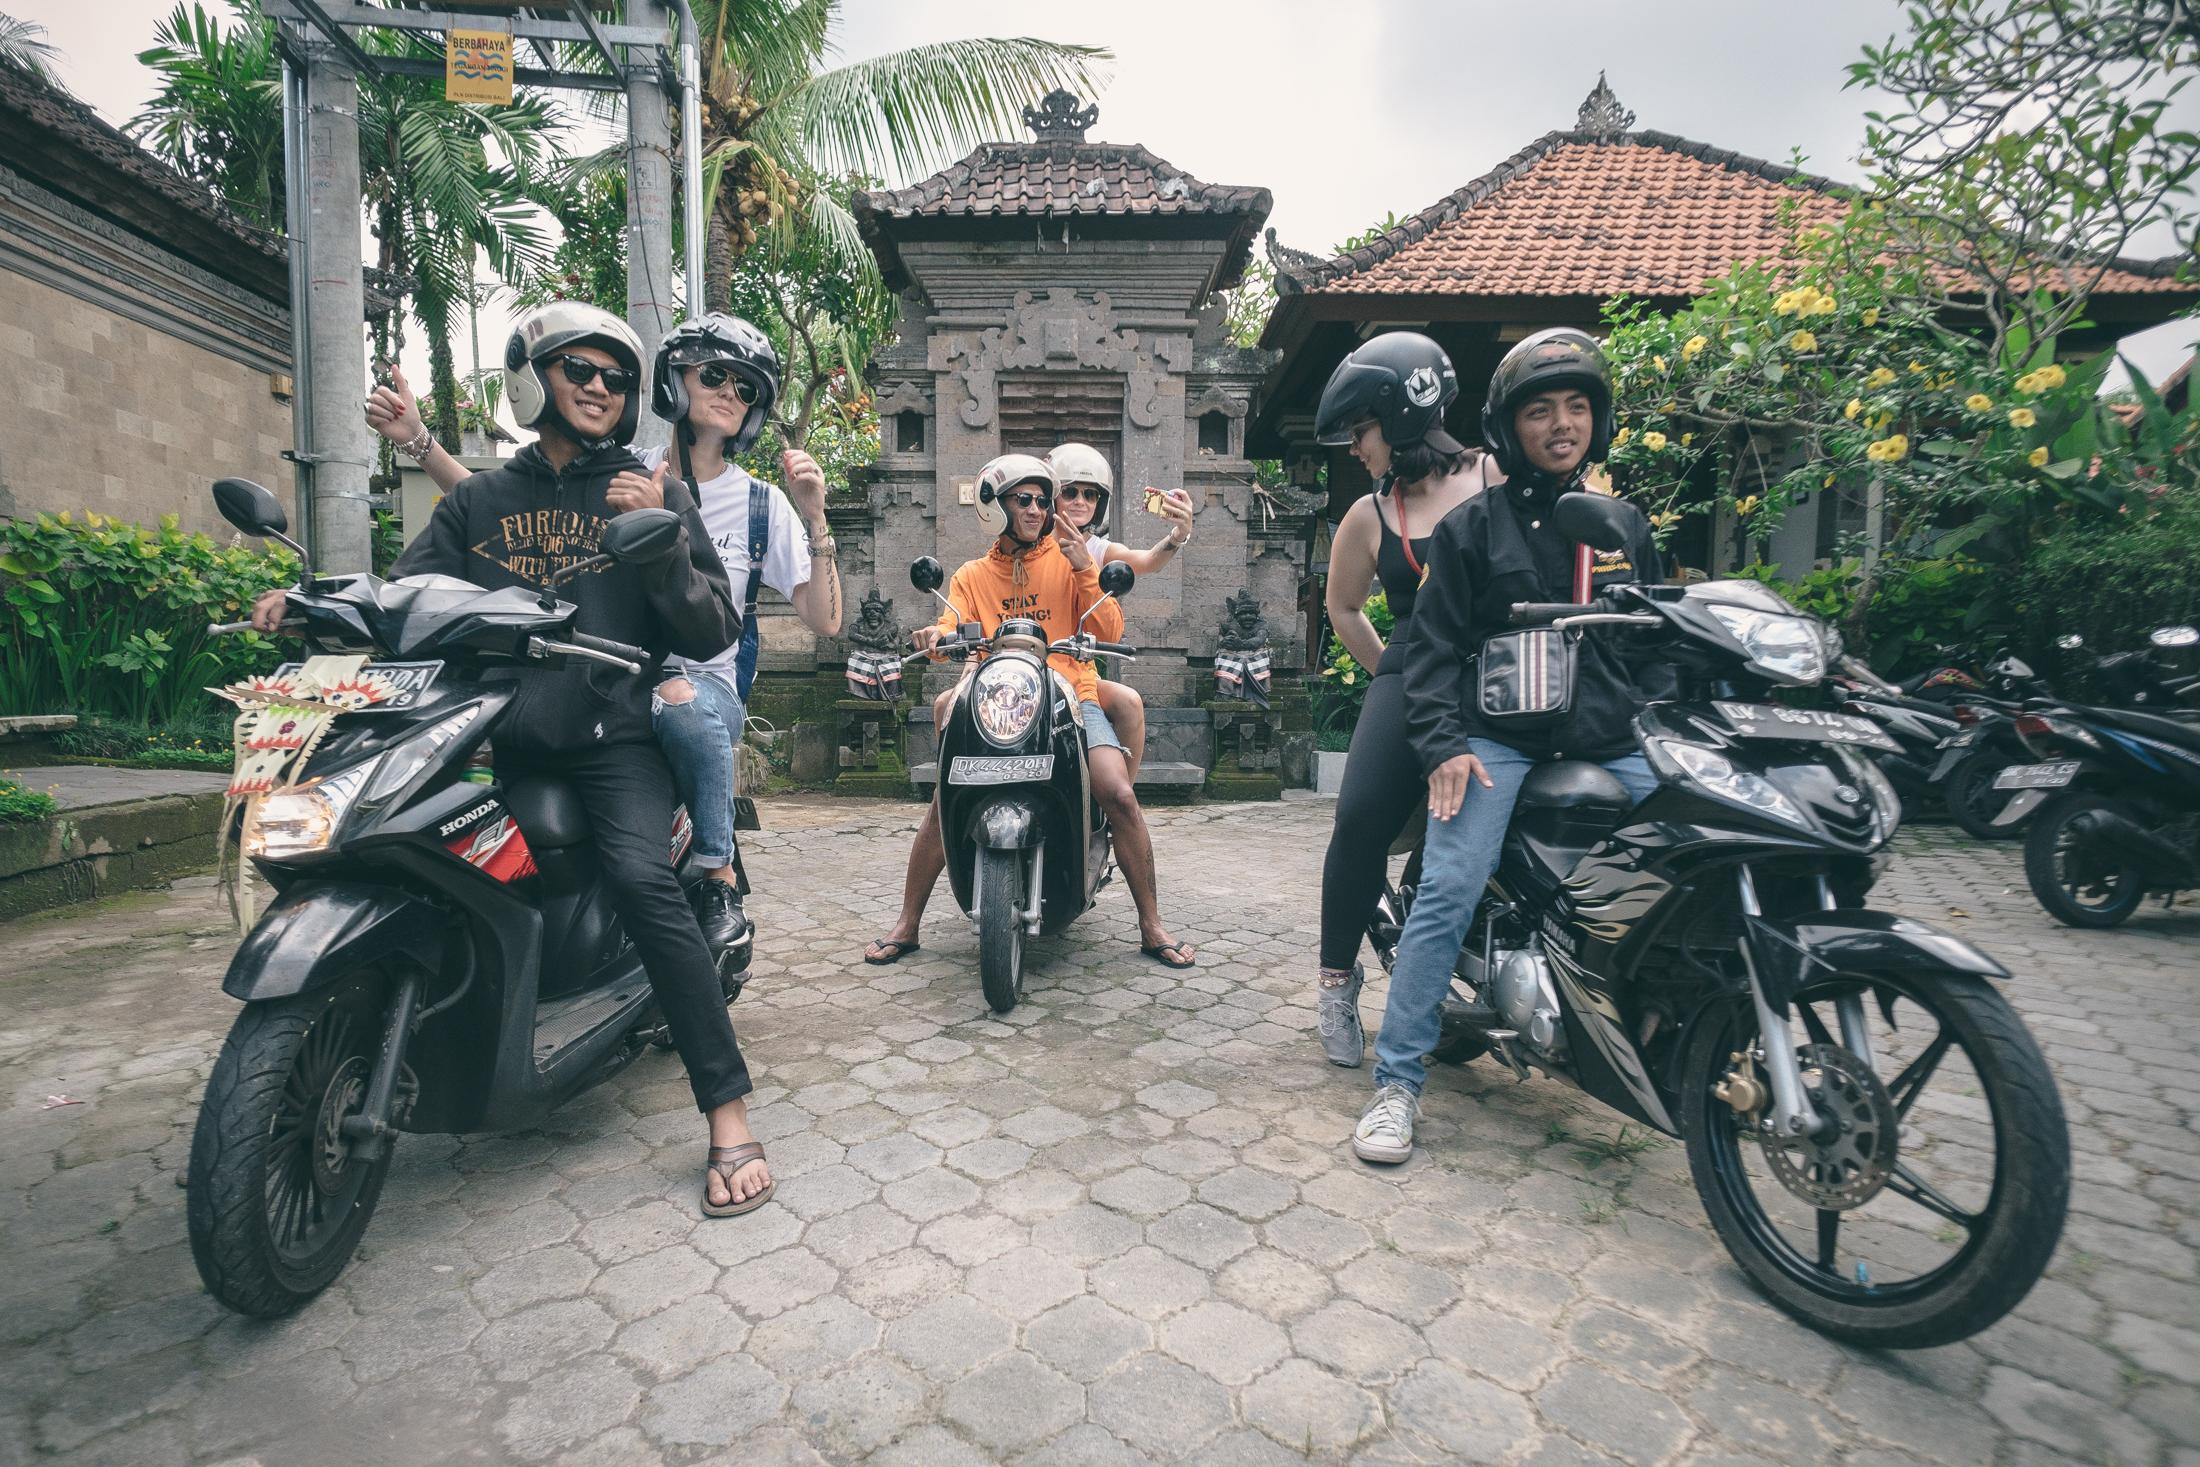 bali_biketour-3.jpg